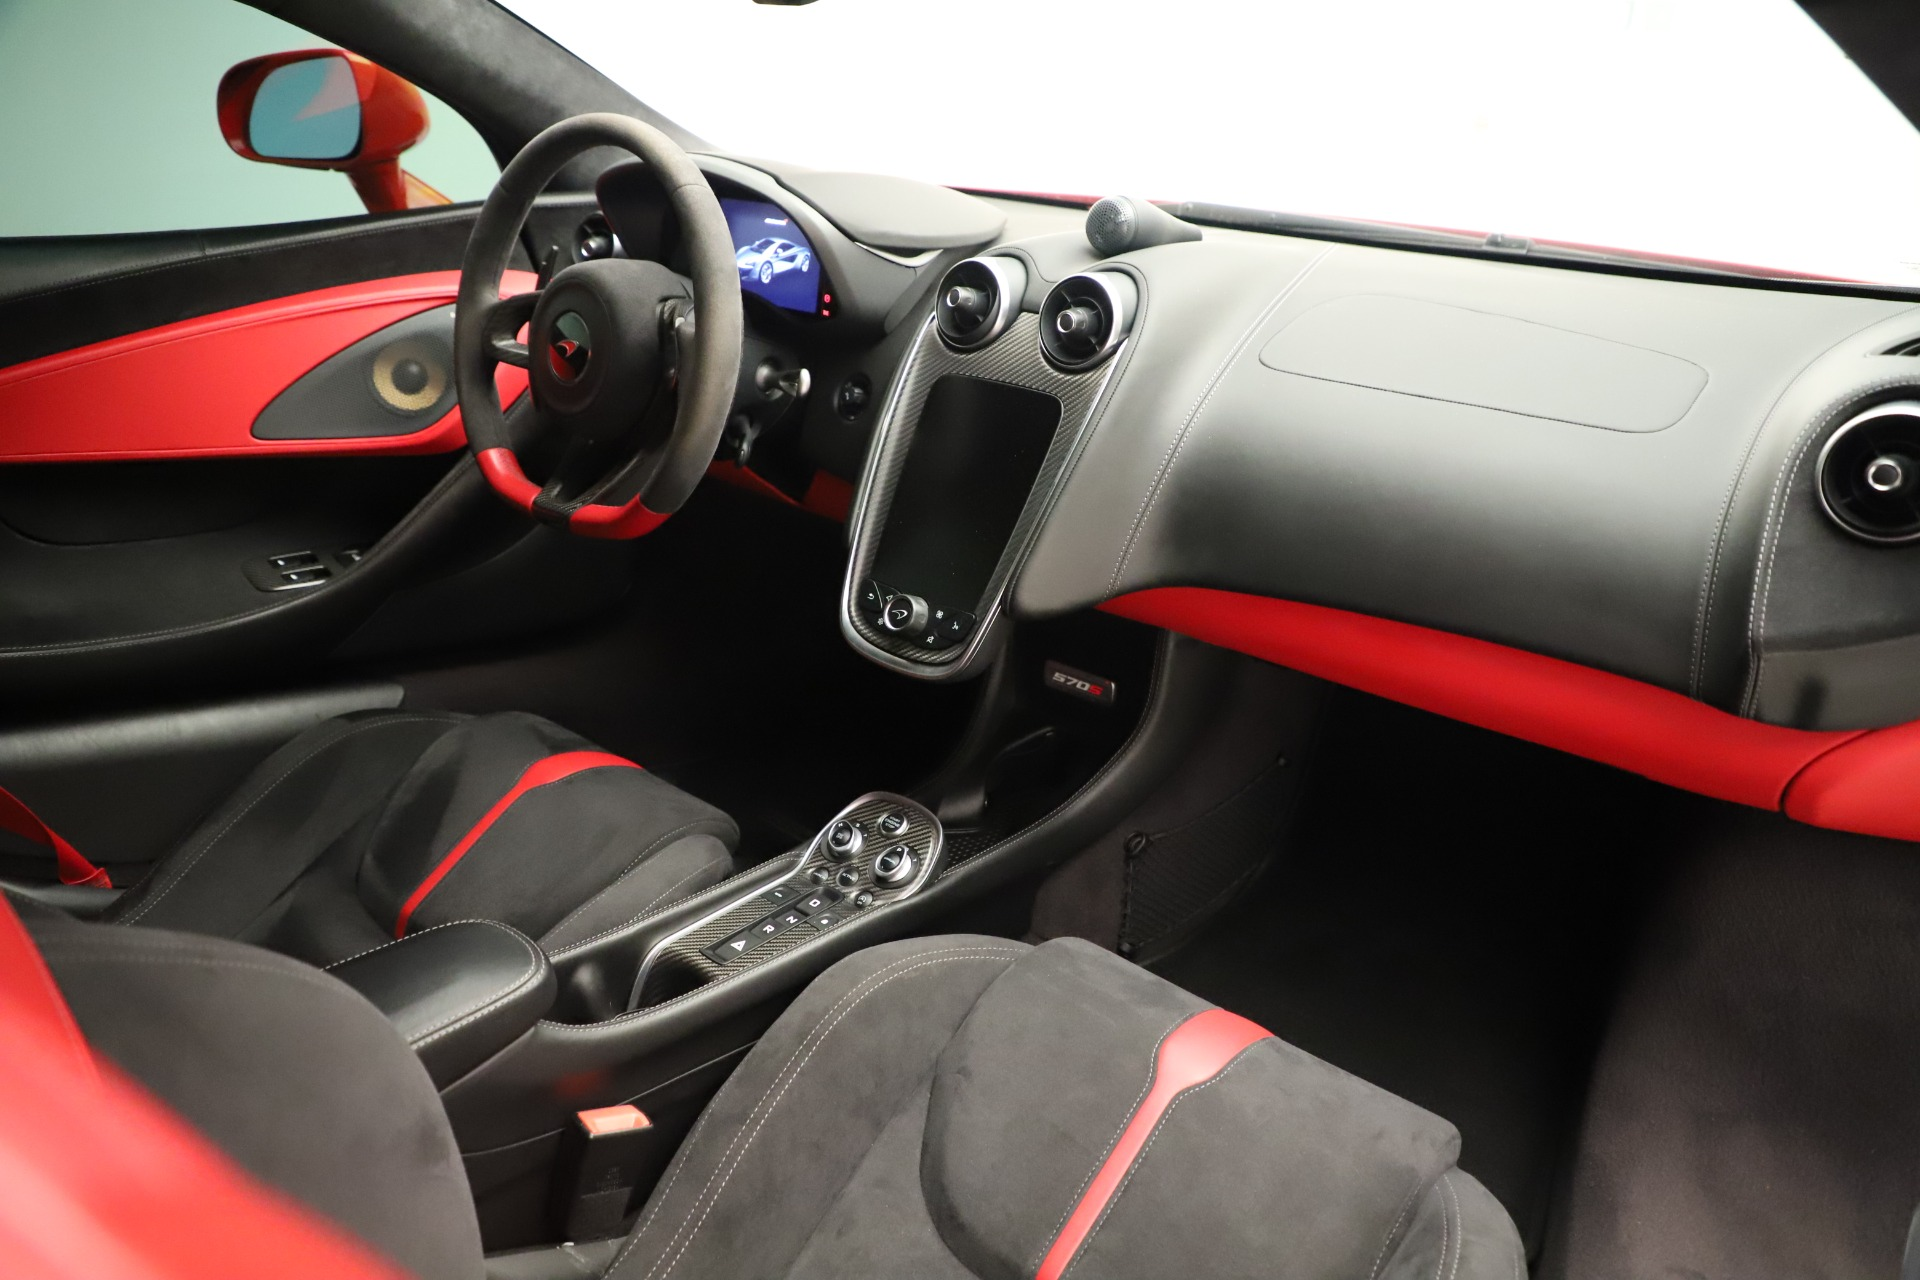 Used 2016 McLaren 570S Coupe For Sale In Westport, CT 3235_p22